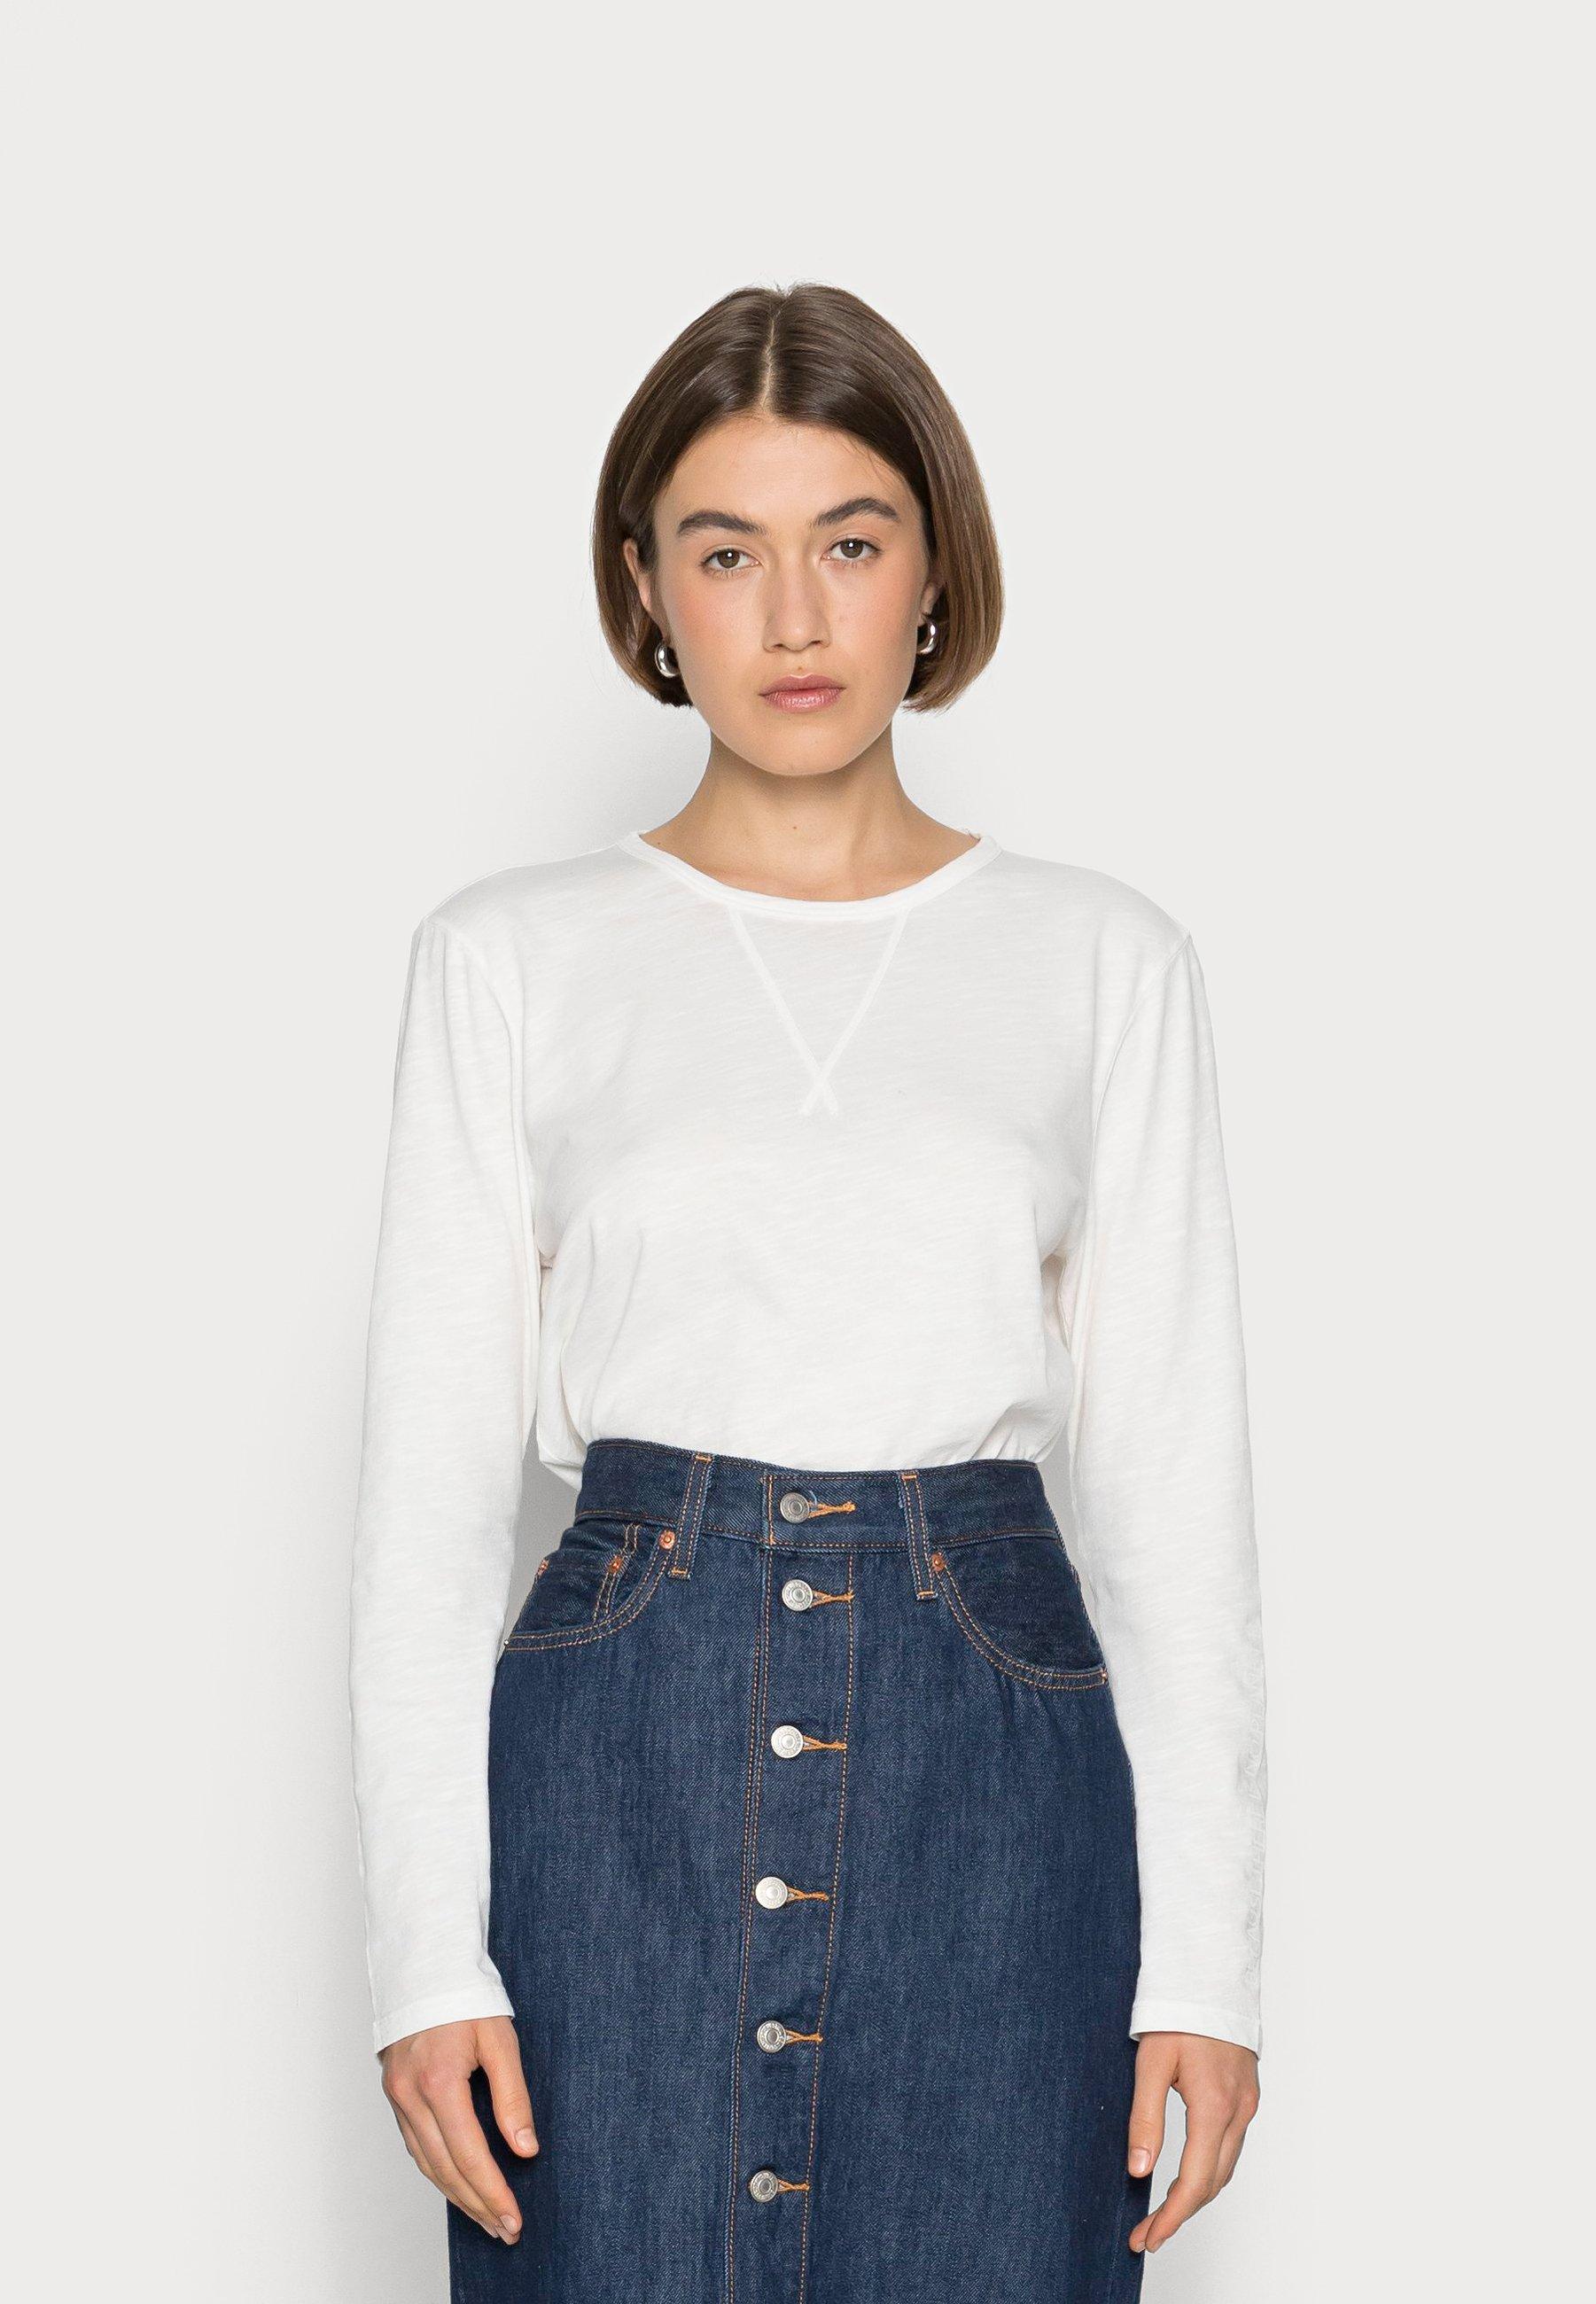 Femme CORTEGANALF WOMAN LONG SLEEVE - T-shirt à manches longues